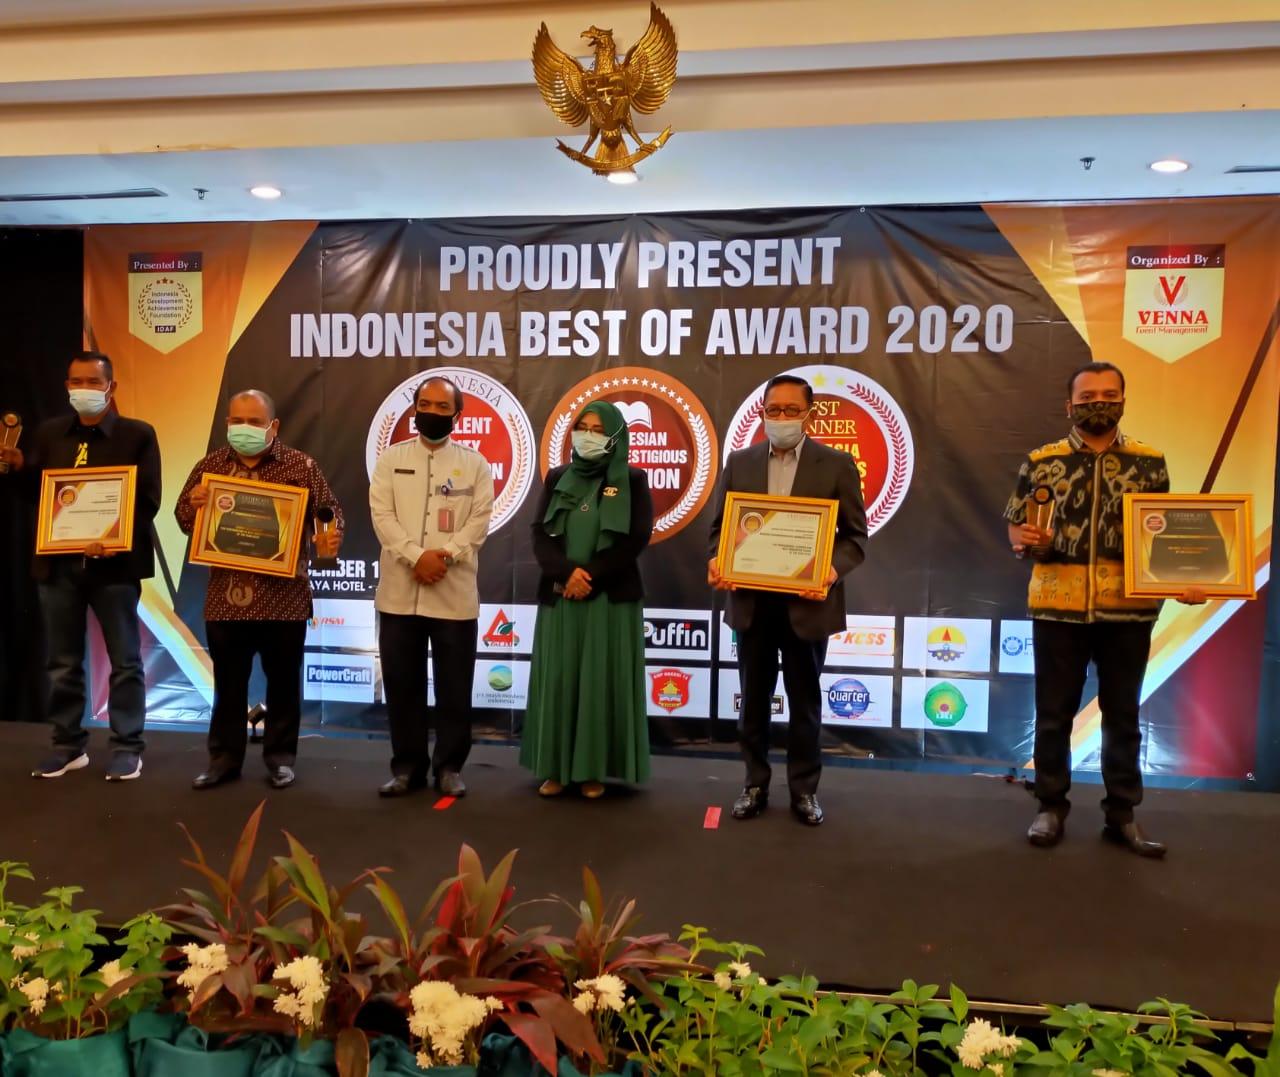 Panitia Indonesia Quality Satisfaction Award menyerahkan penghargaan kepada perwakilan PT RSM di Hotel Grand Sahid Jakarta, Jumat (18/12/2020). (Foto: Humas Pemkab Tuban)